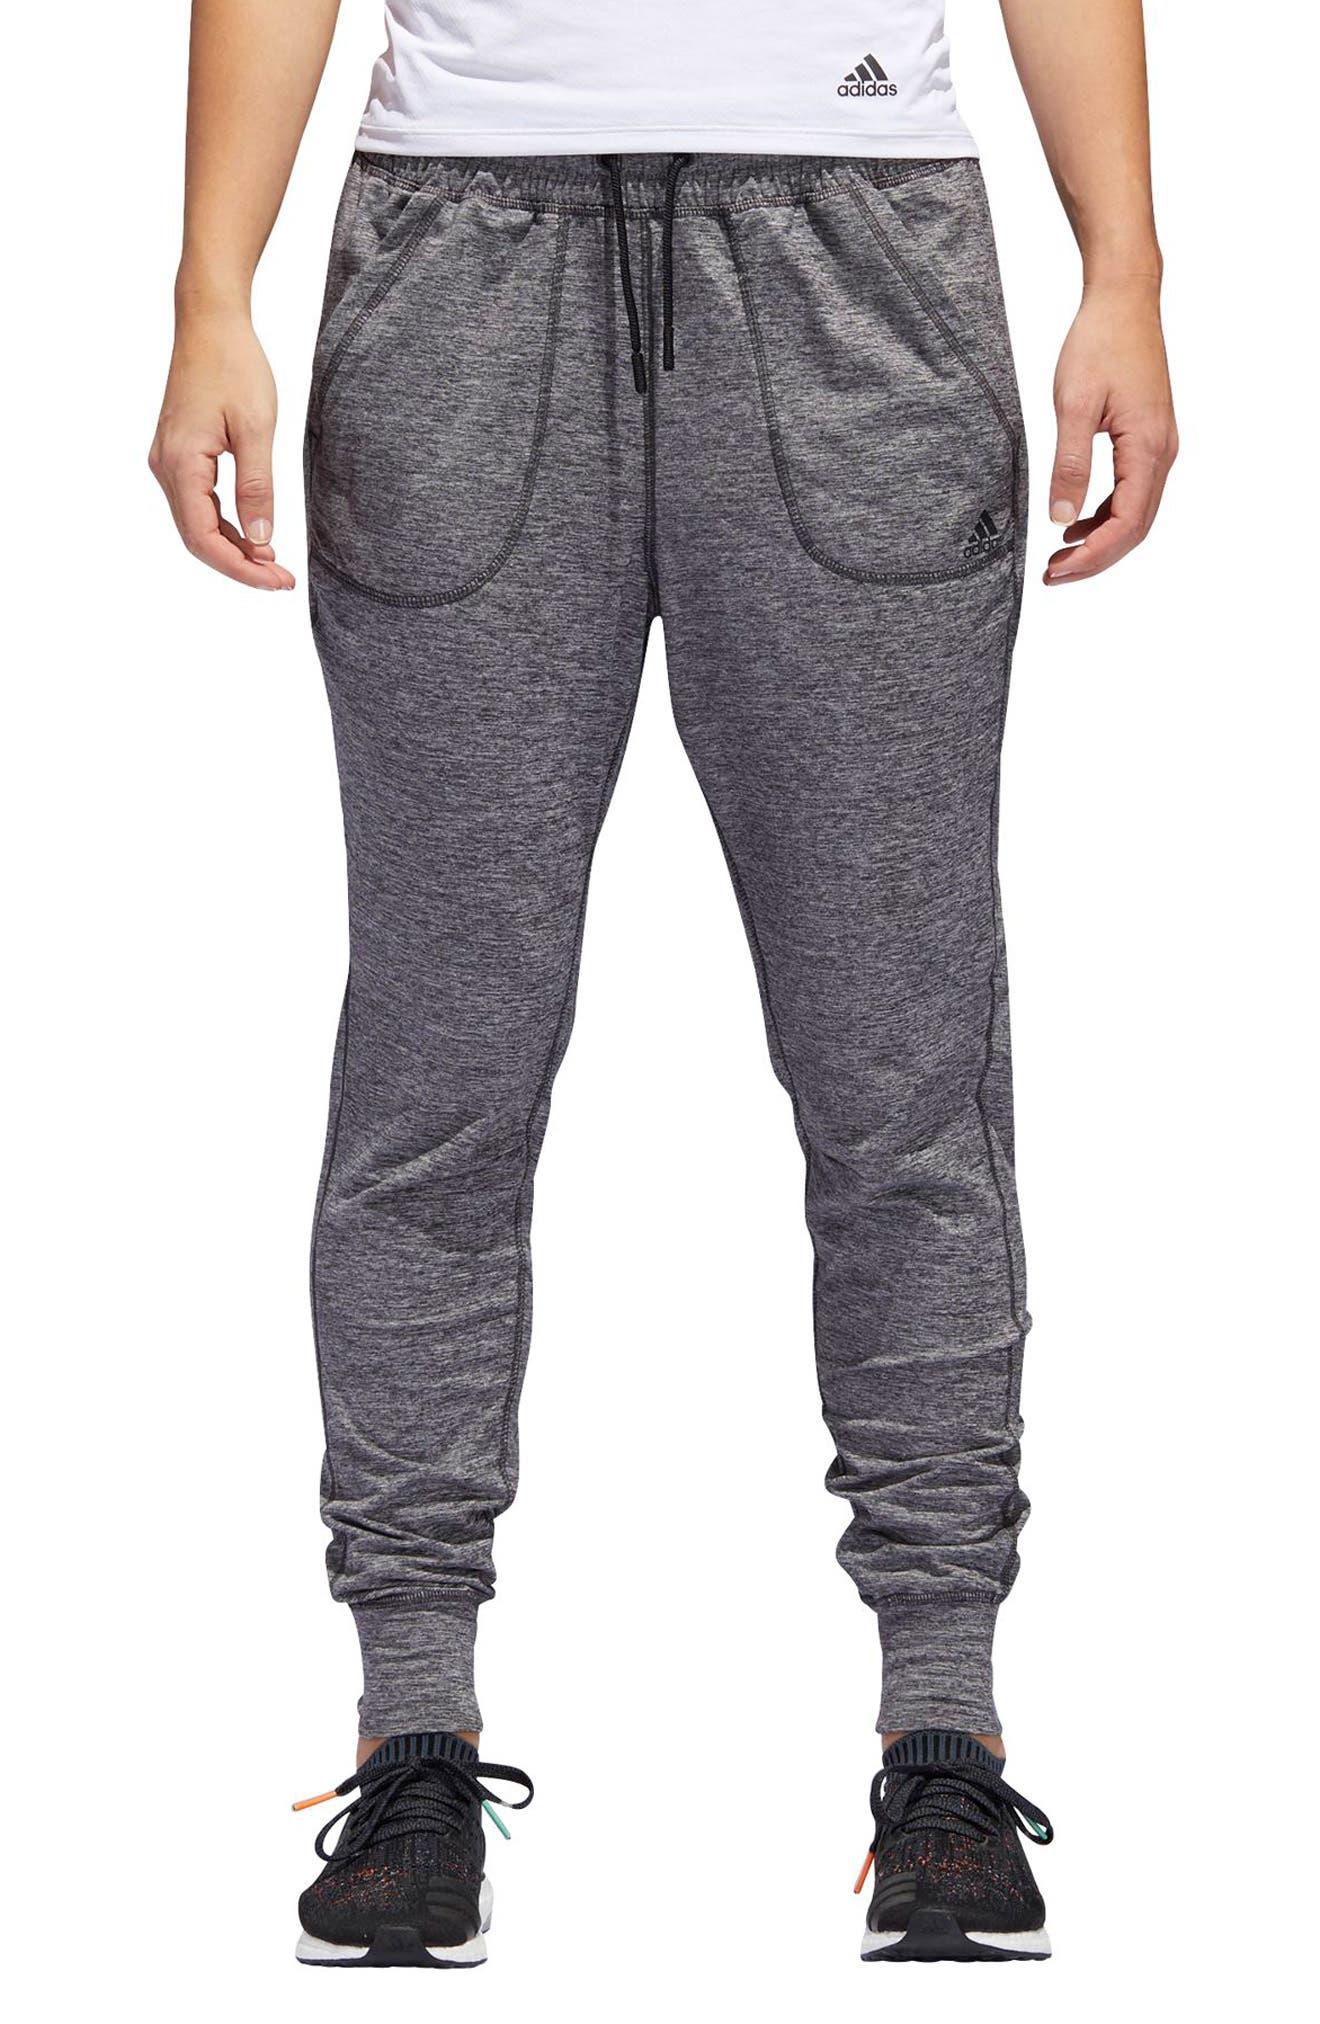 ADIDAS ID LBD Jogger Pants, Main, color, 001